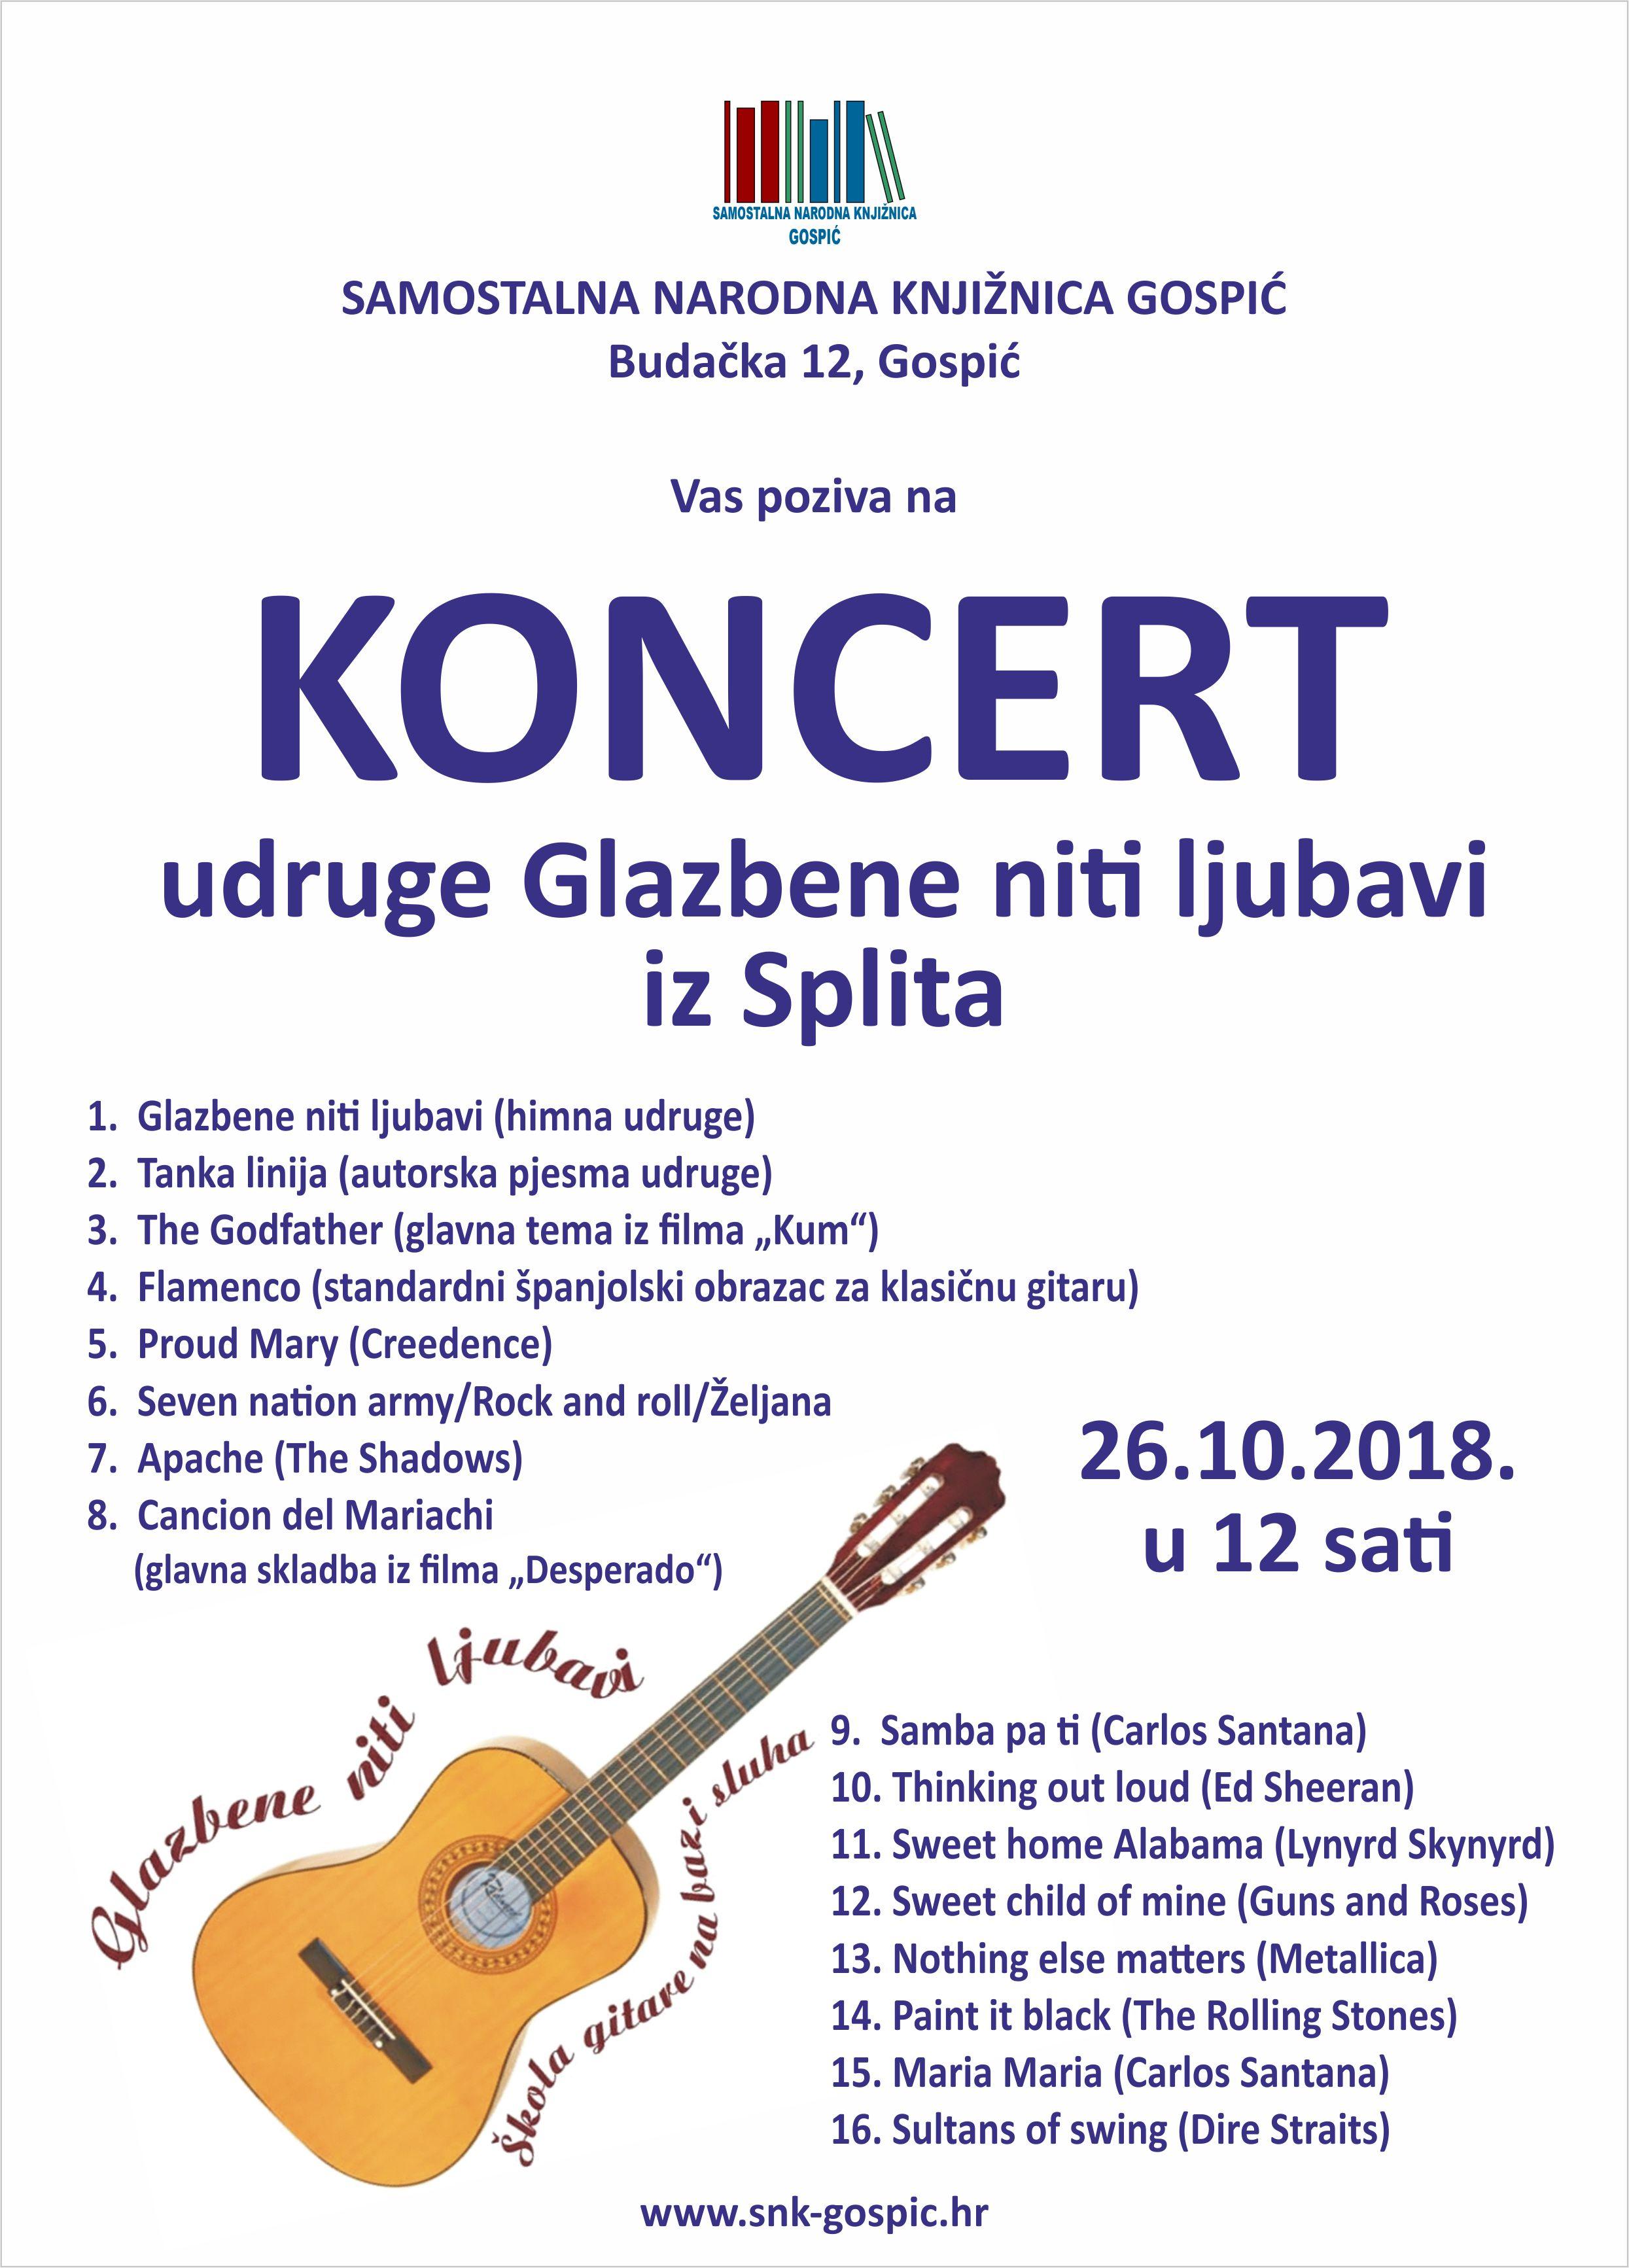 KONCERT udruge Glazbene niti ljubavi iz Splita